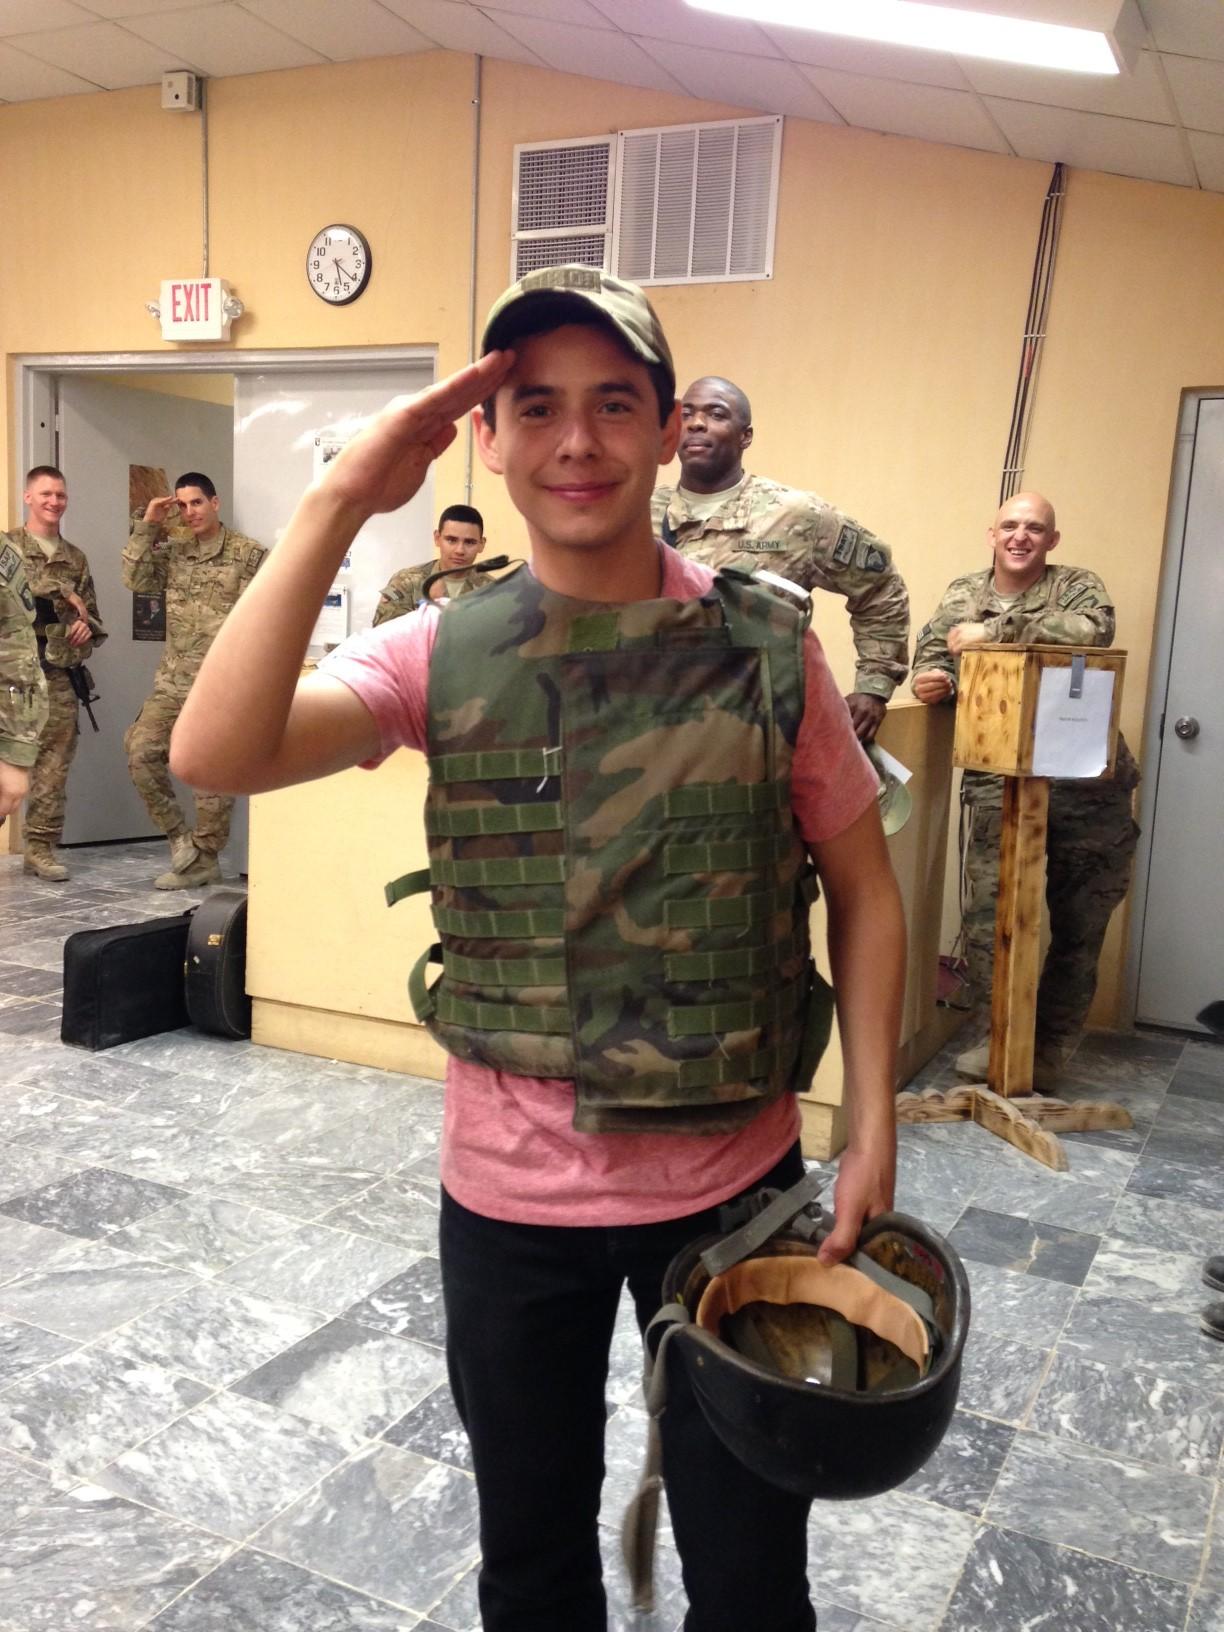 David-Archuleta-camo-military-tour